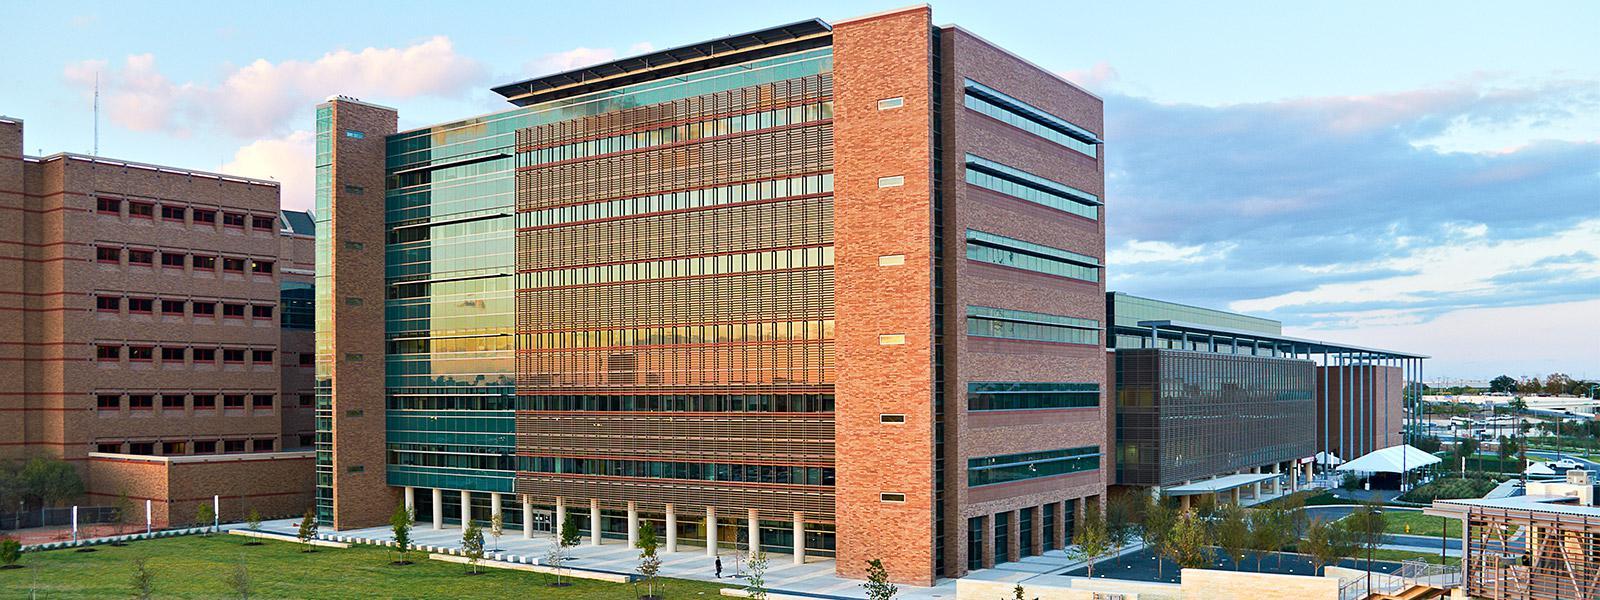 San-Antonio-Military-Medical-Center_Main-Image_0